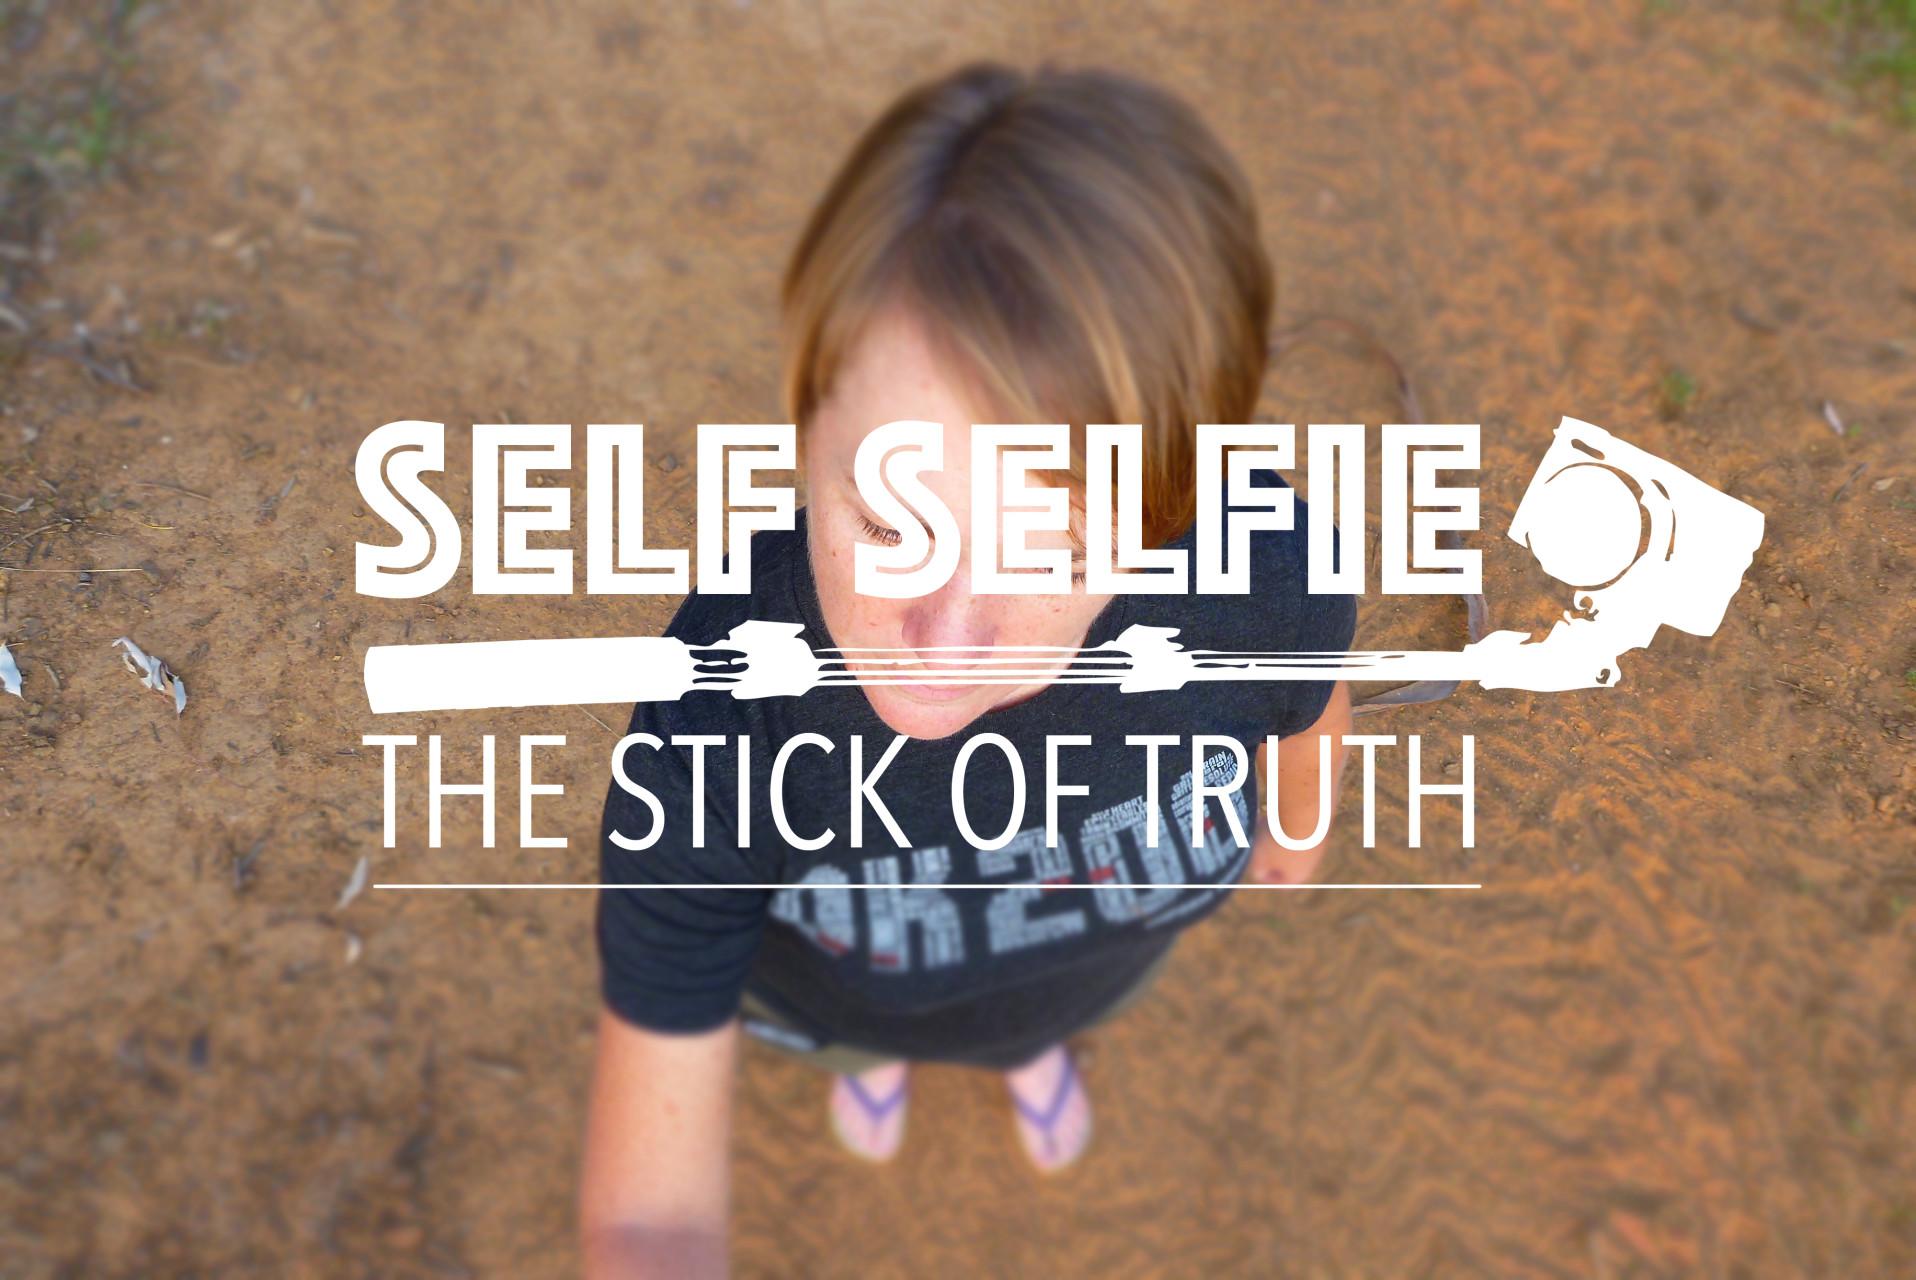 selfselfie_title